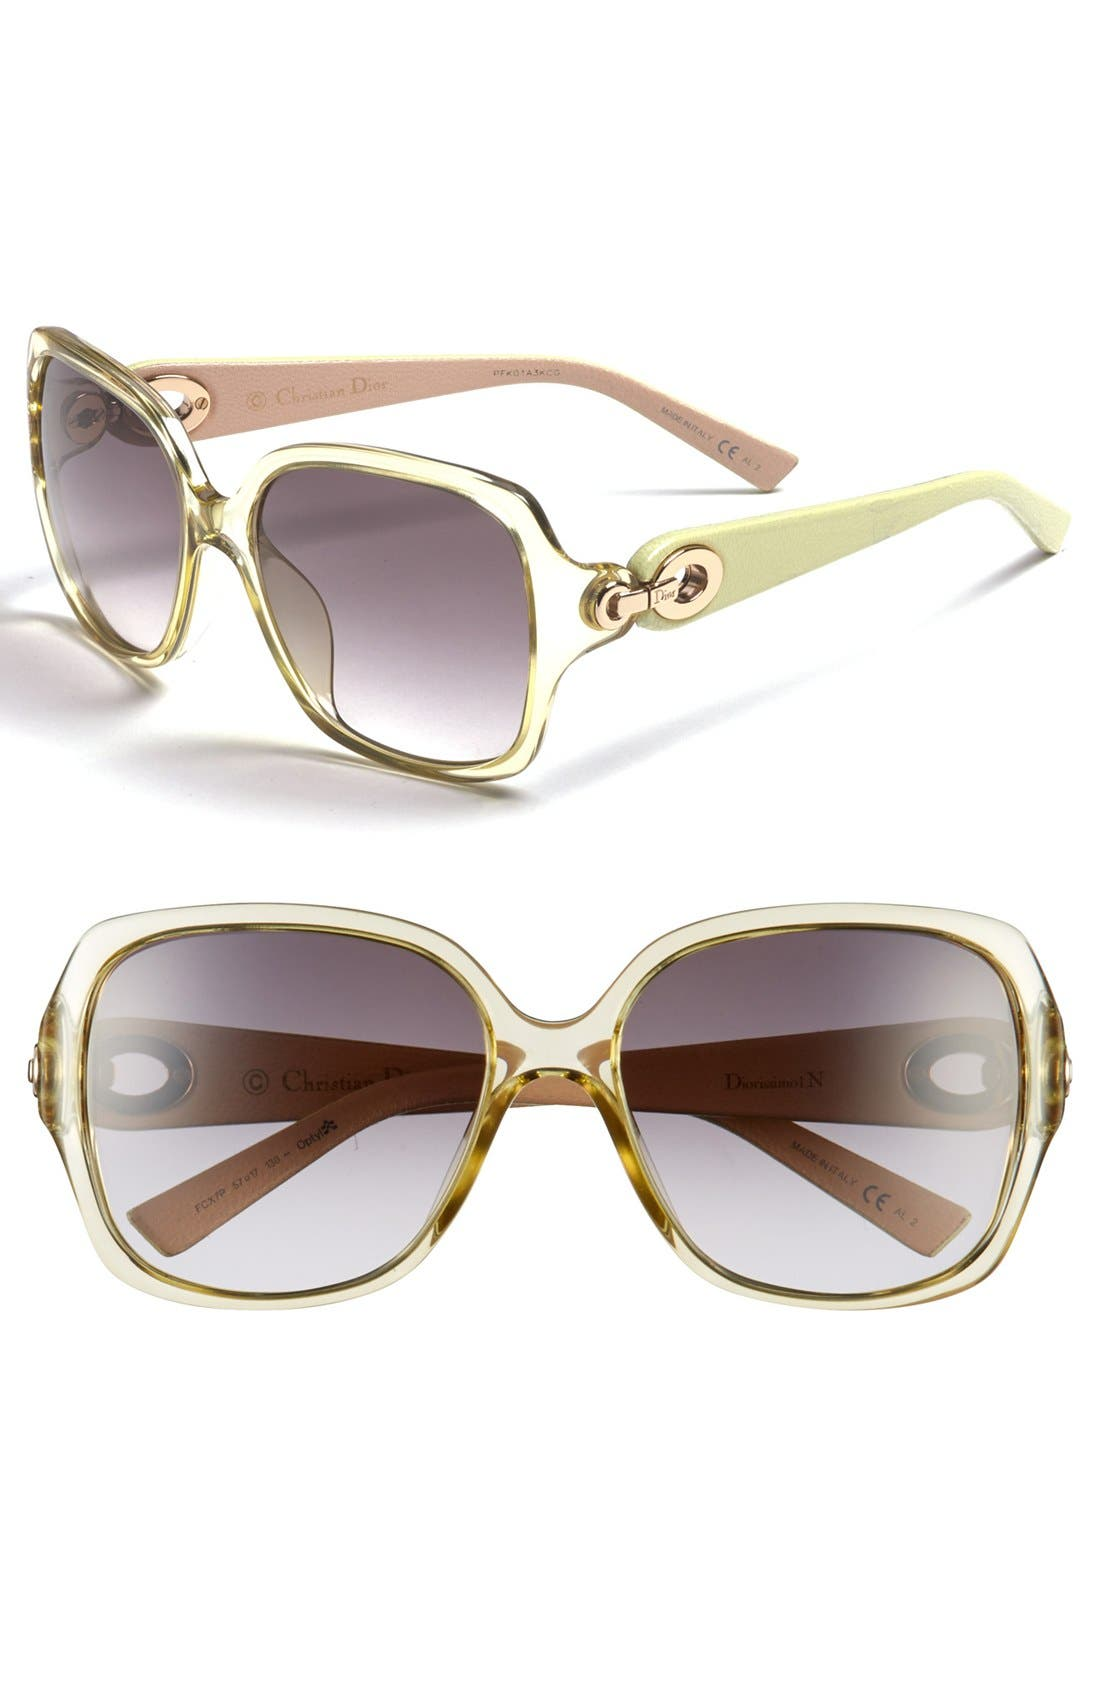 Main Image - Christian Dior 57mm Sunglasses